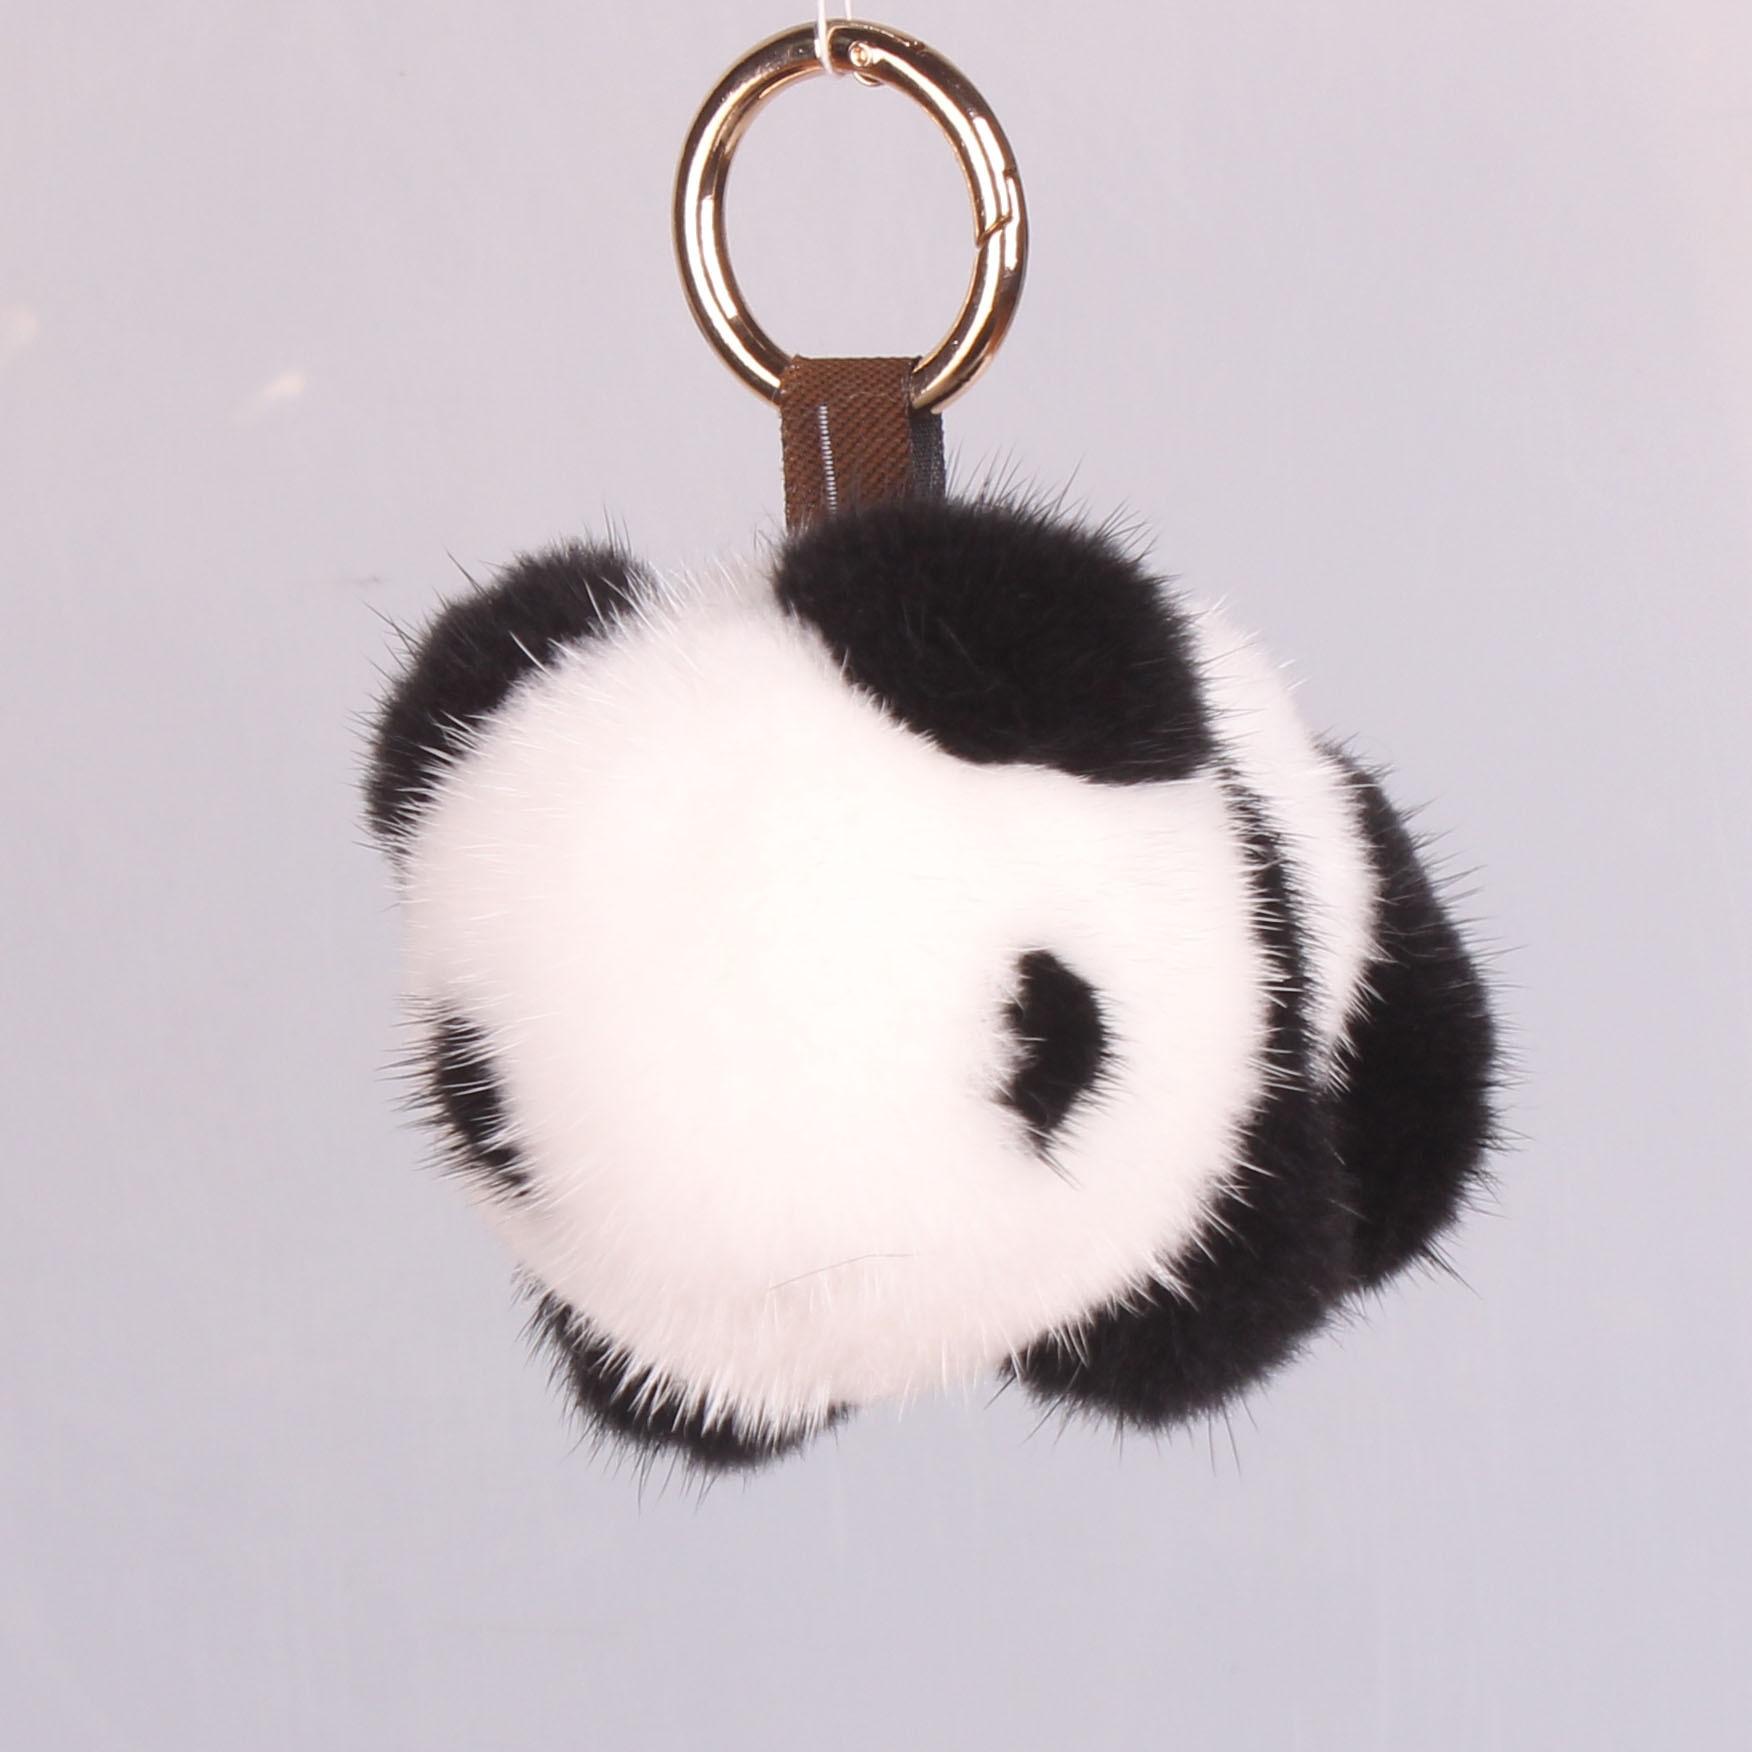 Panda Keychain Mink Panda jewelry plush ornaments fur bag pendant keychains key chain key chains cute keychain fur keychain|Key Chains| - AliExpress